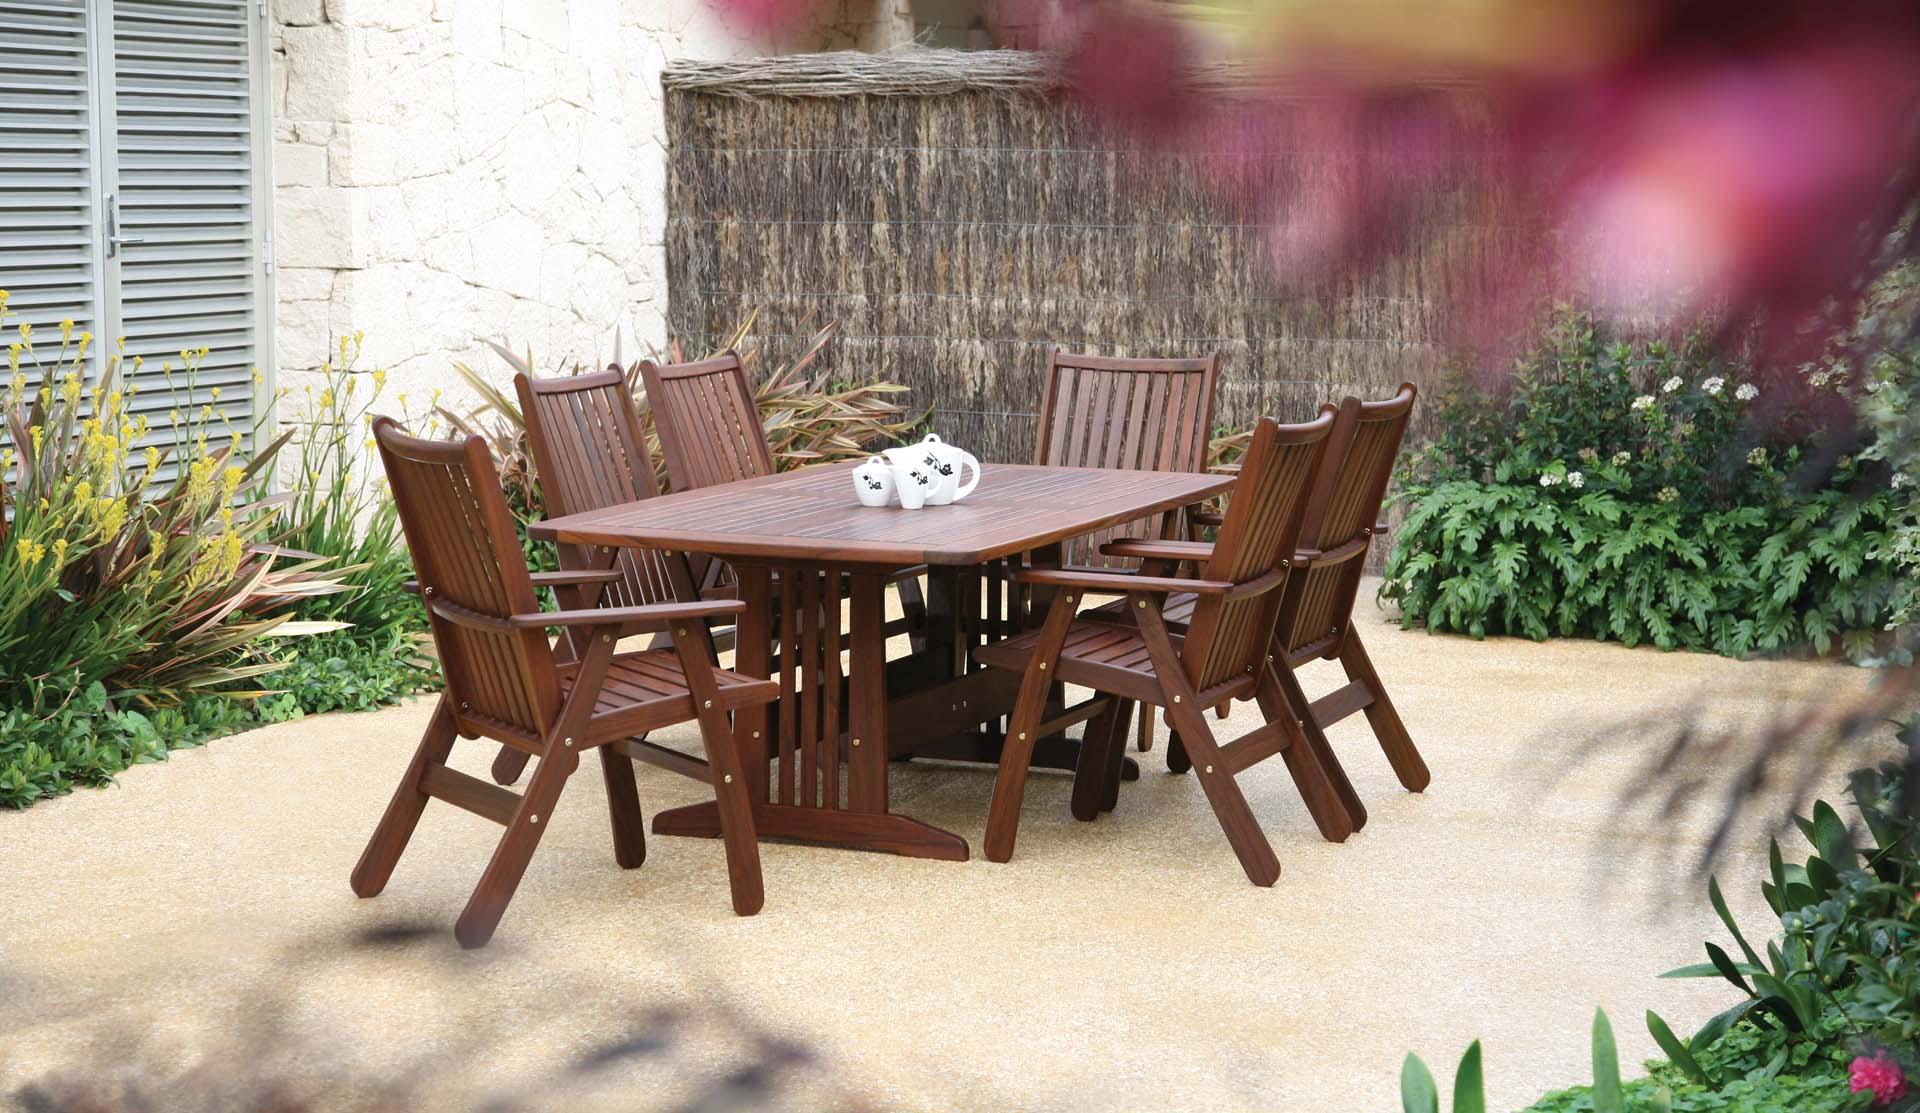 furniture product madrid chat set bjs imageservice profileid patio recipeid club imageid jensen wholesale pit fire pc berkley